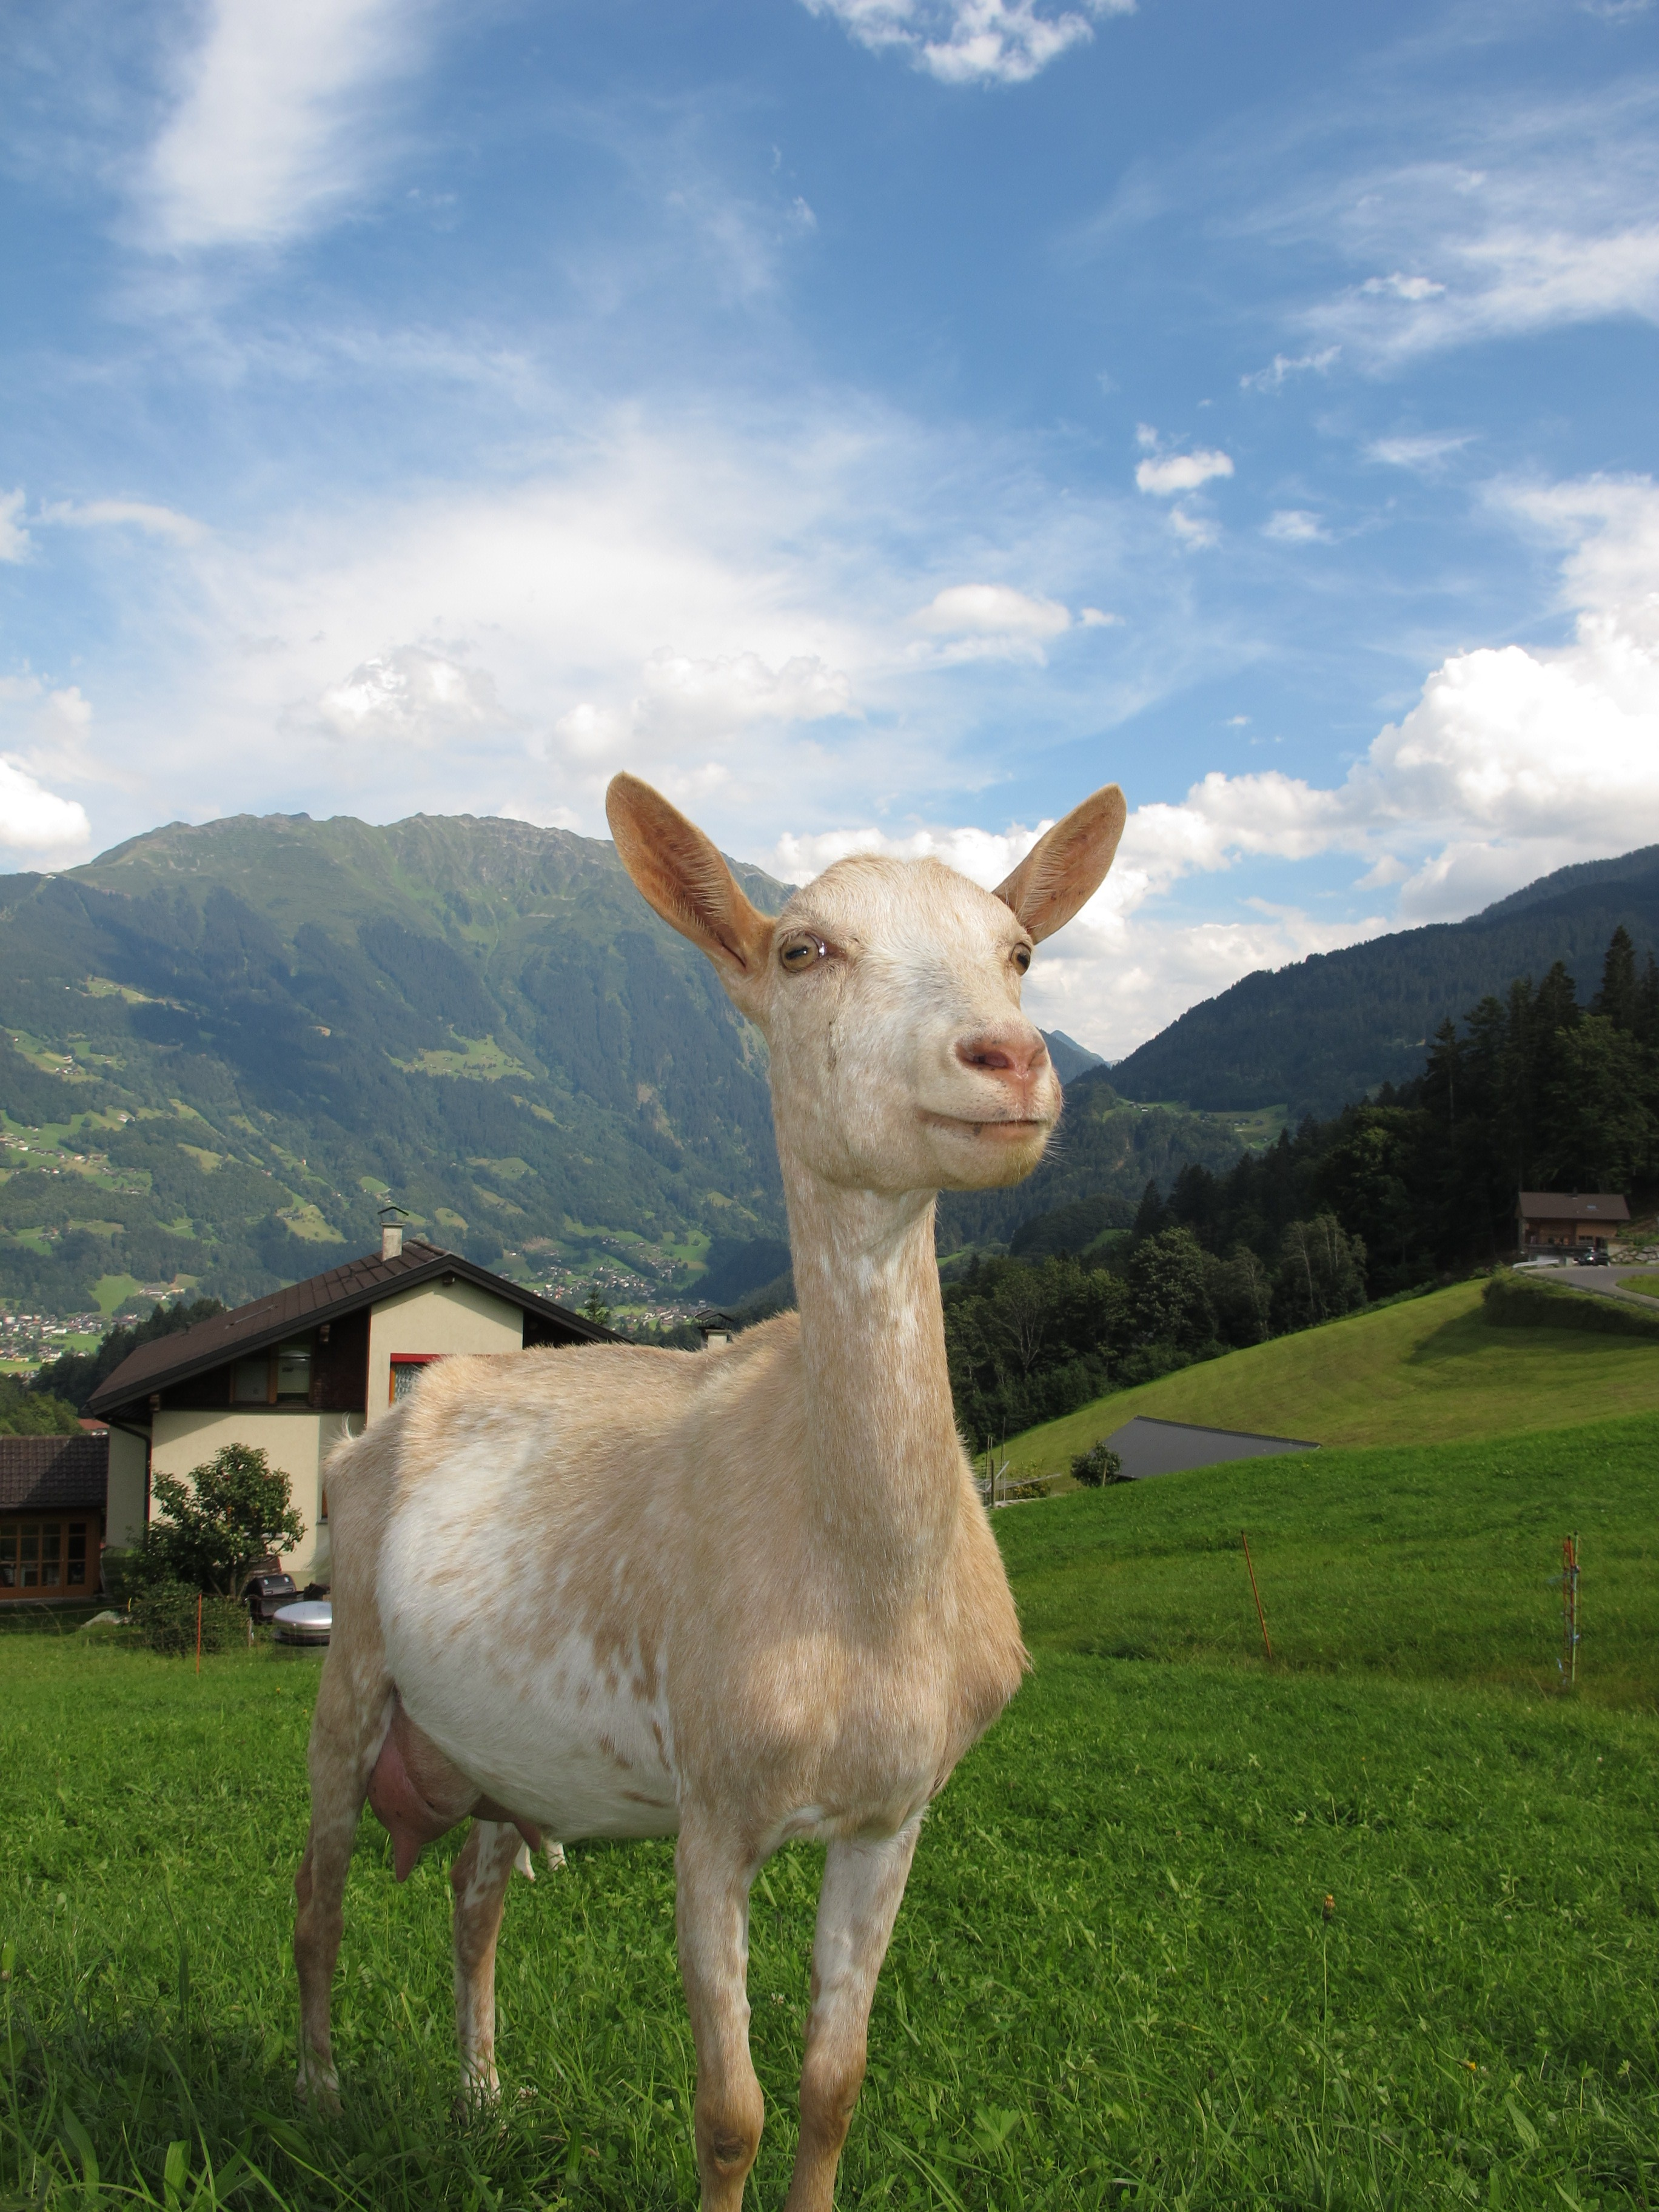 White Goat Eating Grass During Daytime 183 Free Stock Photo